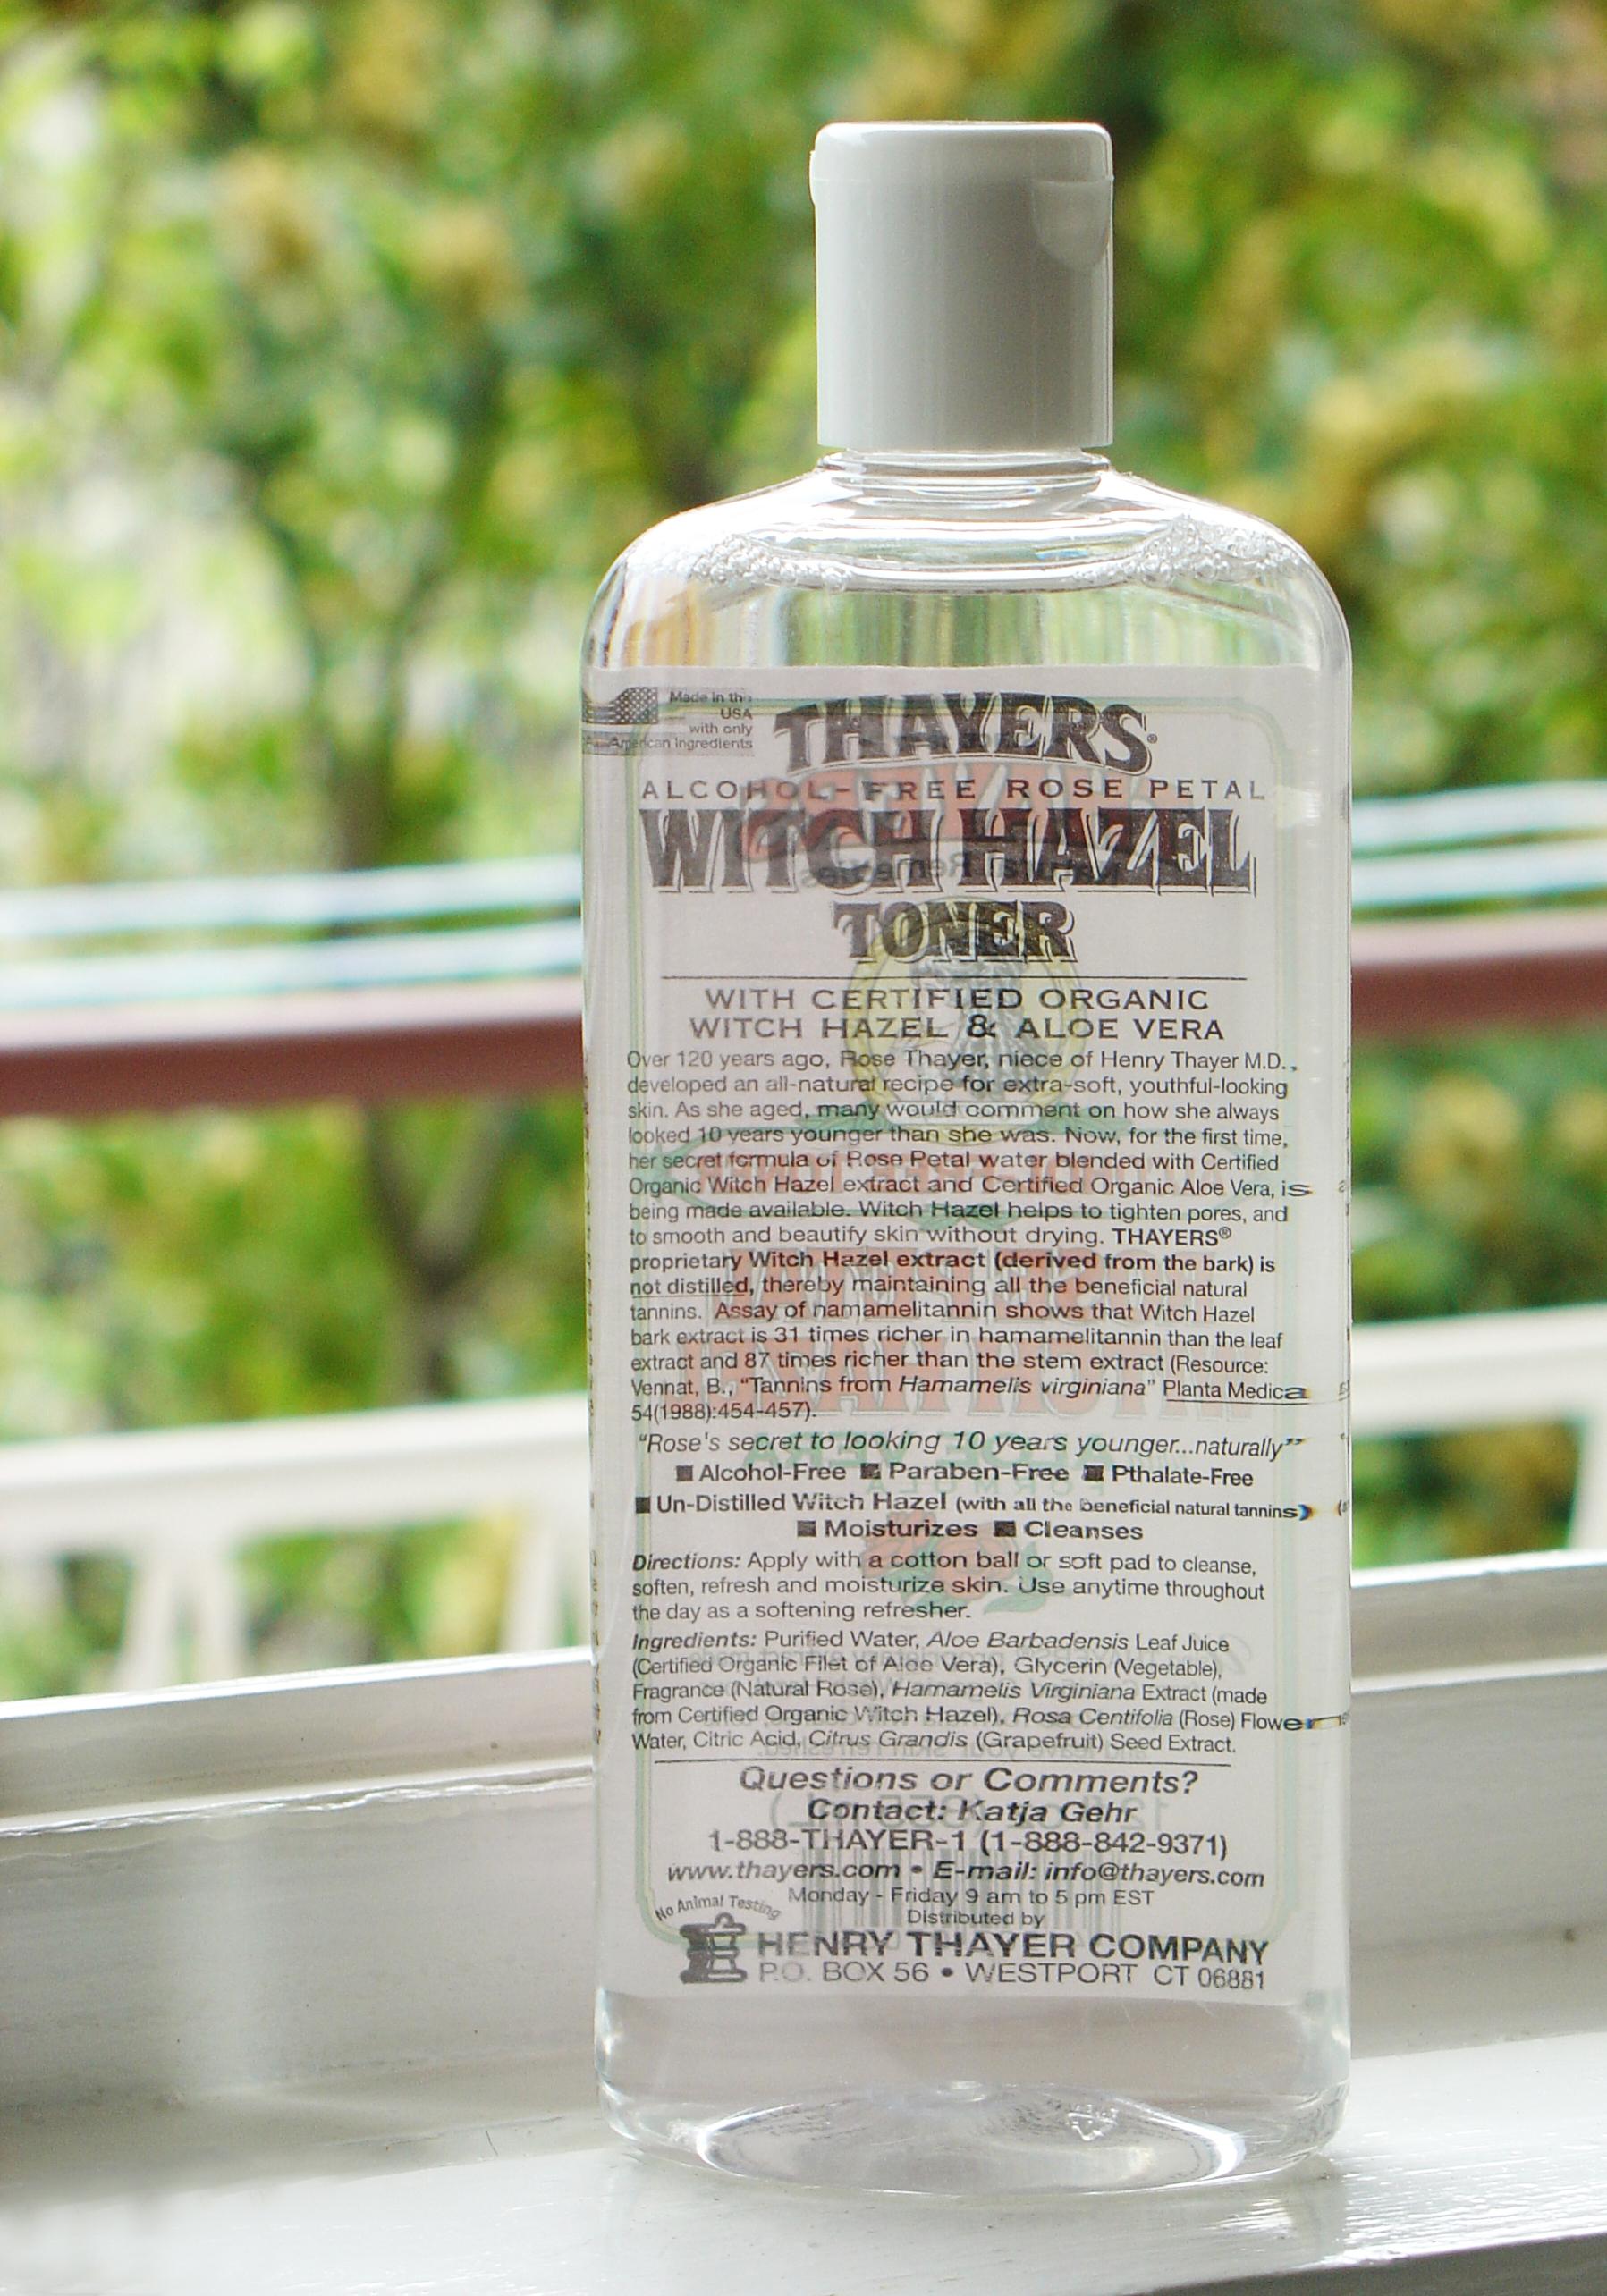 thayers Thayers Rose Petal Witch Hazel Toner